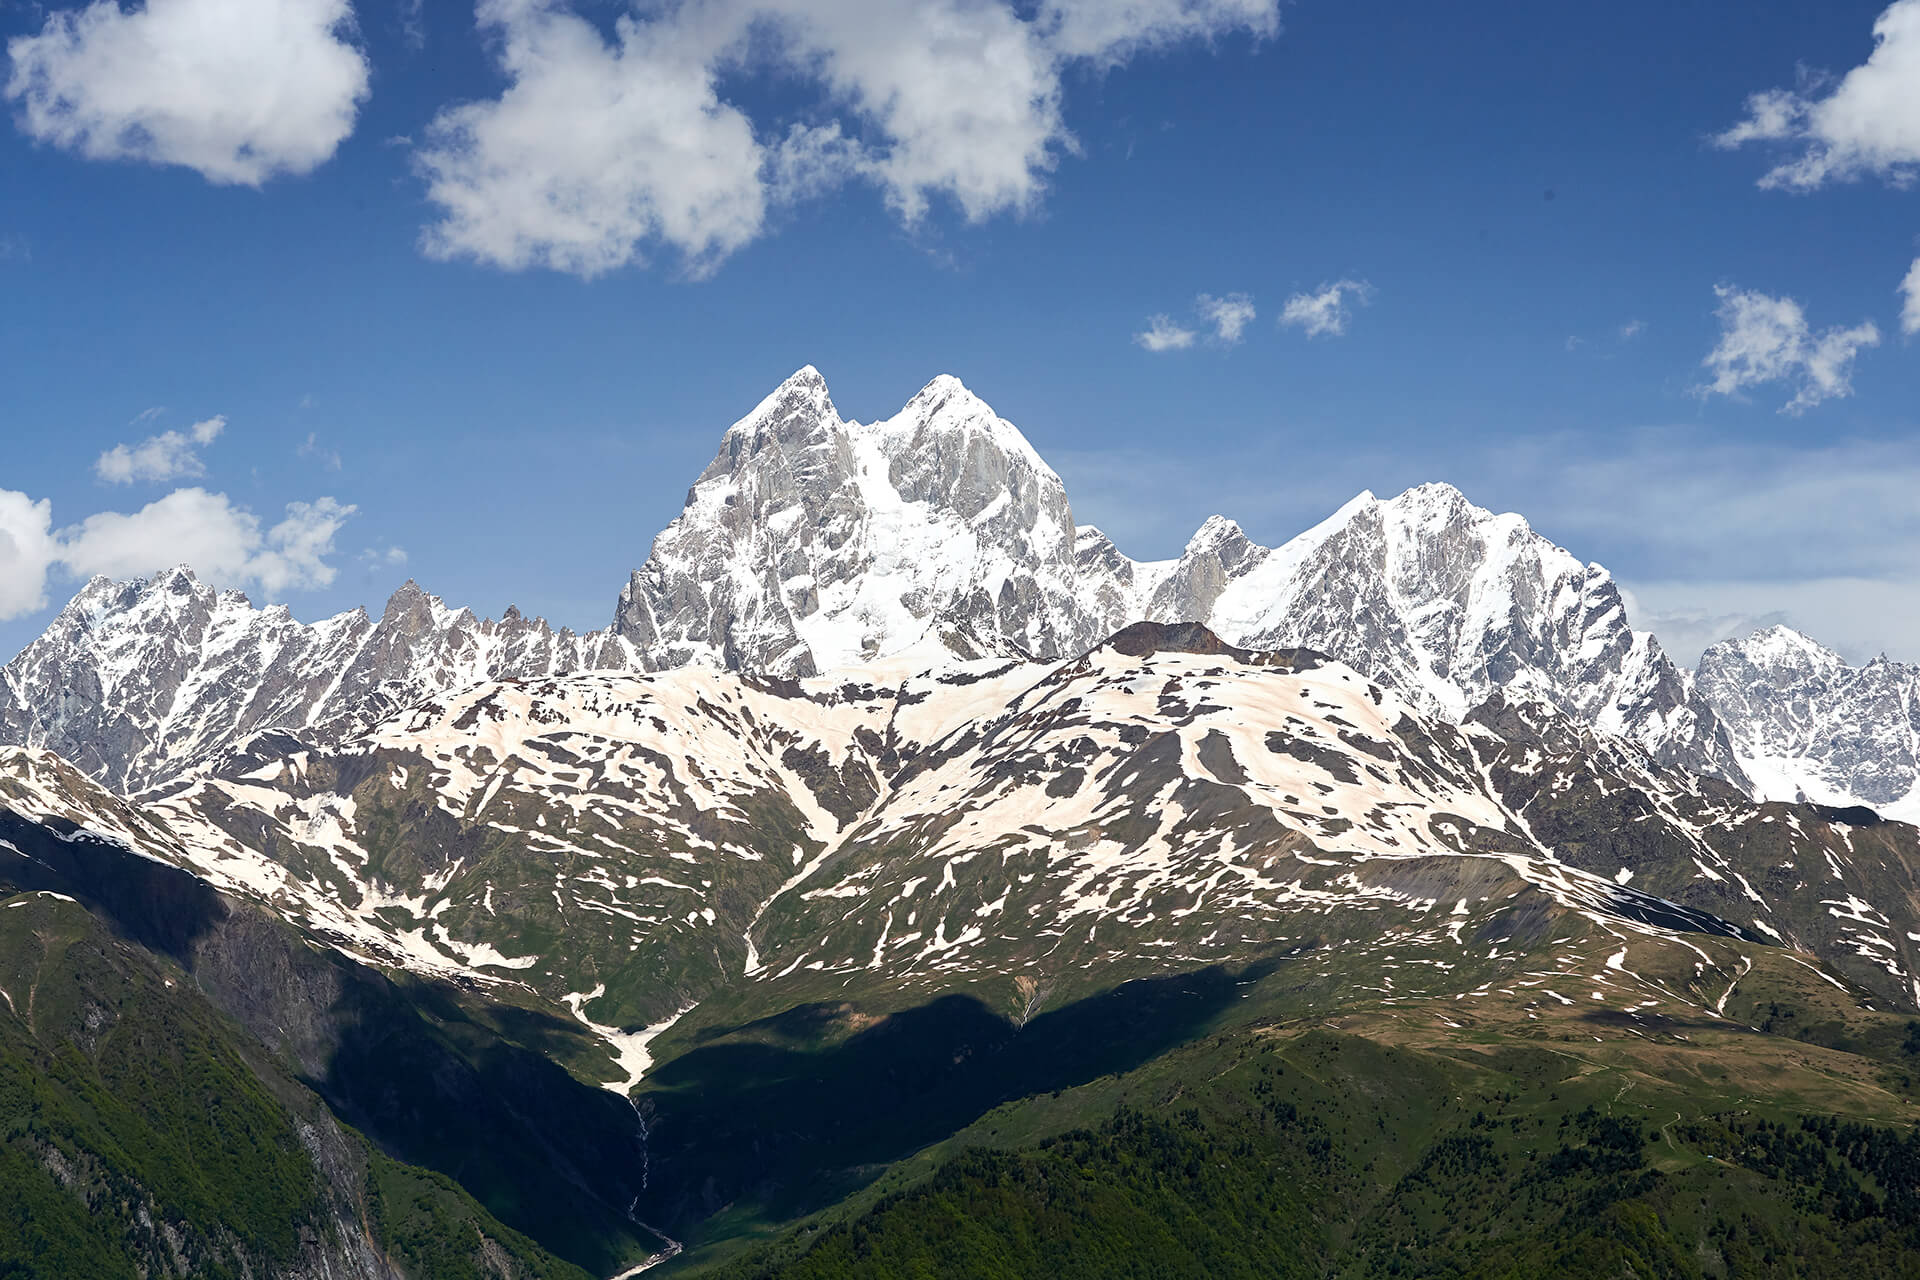 Four day hiking in Svaneti region